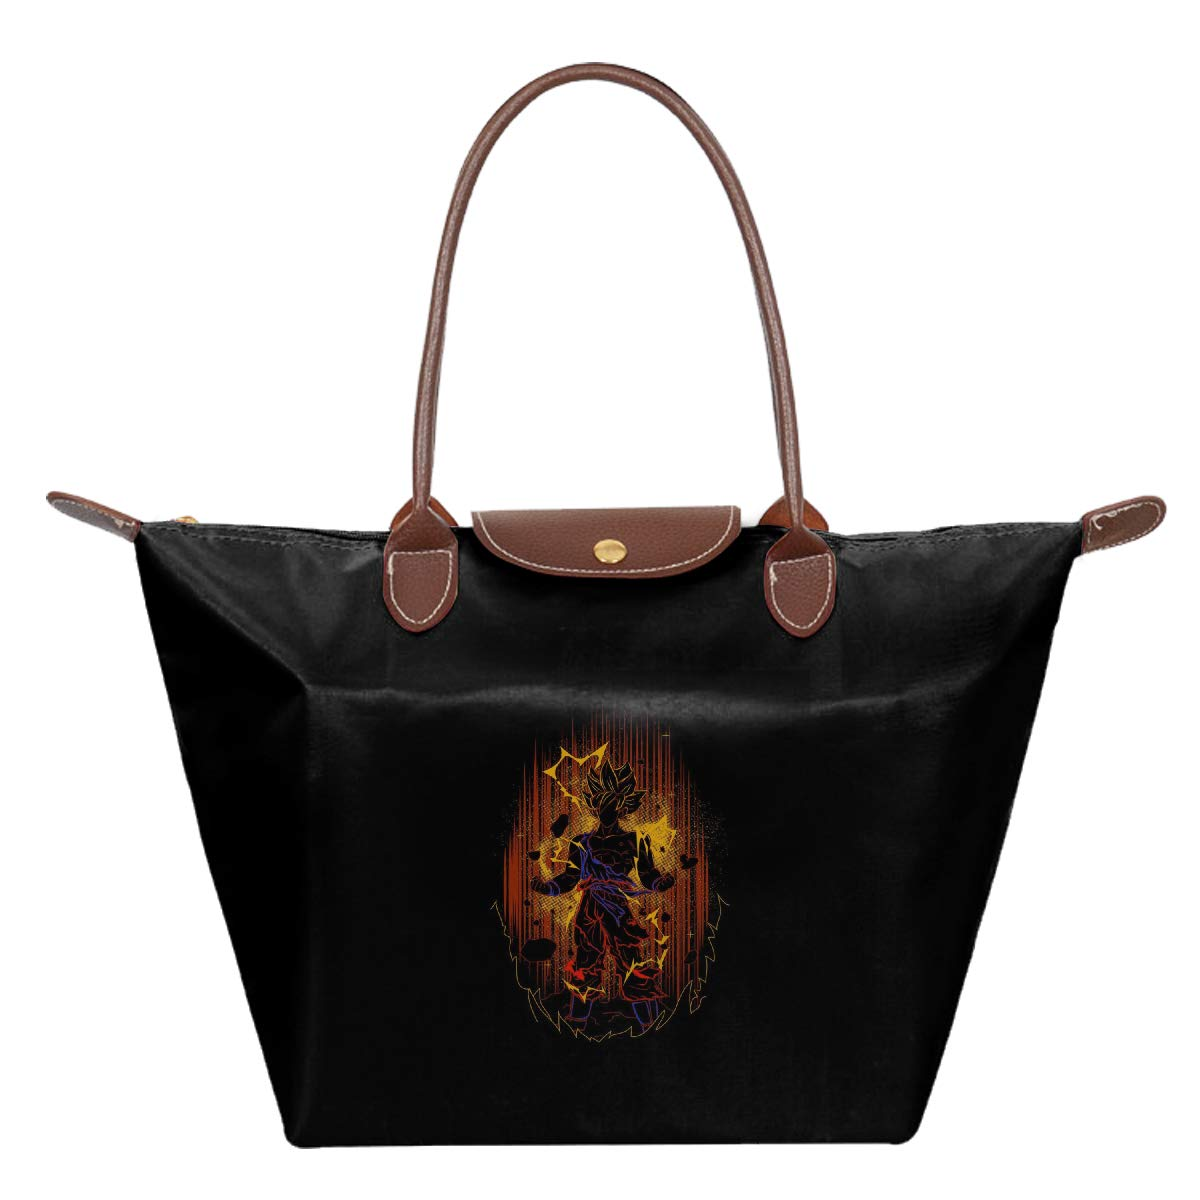 Dragon Ball Z Goku Shadow Waterproof Leather Folded Messenger Nylon Bag Travel Tote Hopping Folding School Handbags